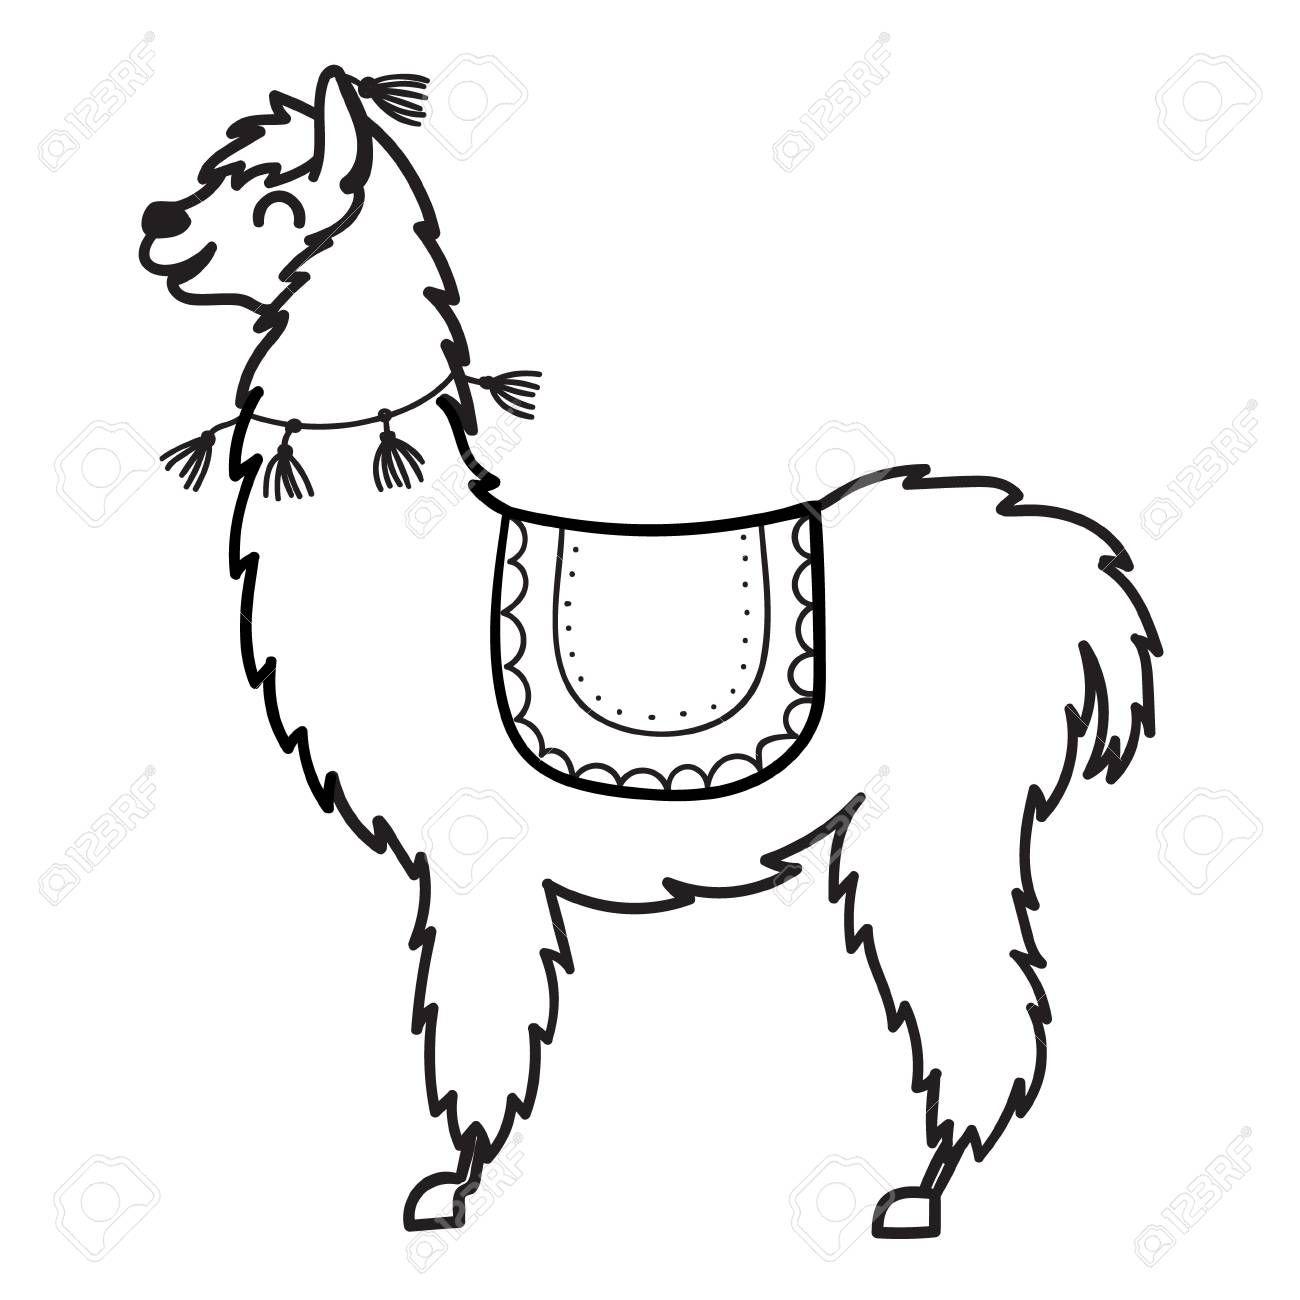 Alpaca clipart animal american. Stock vector art and